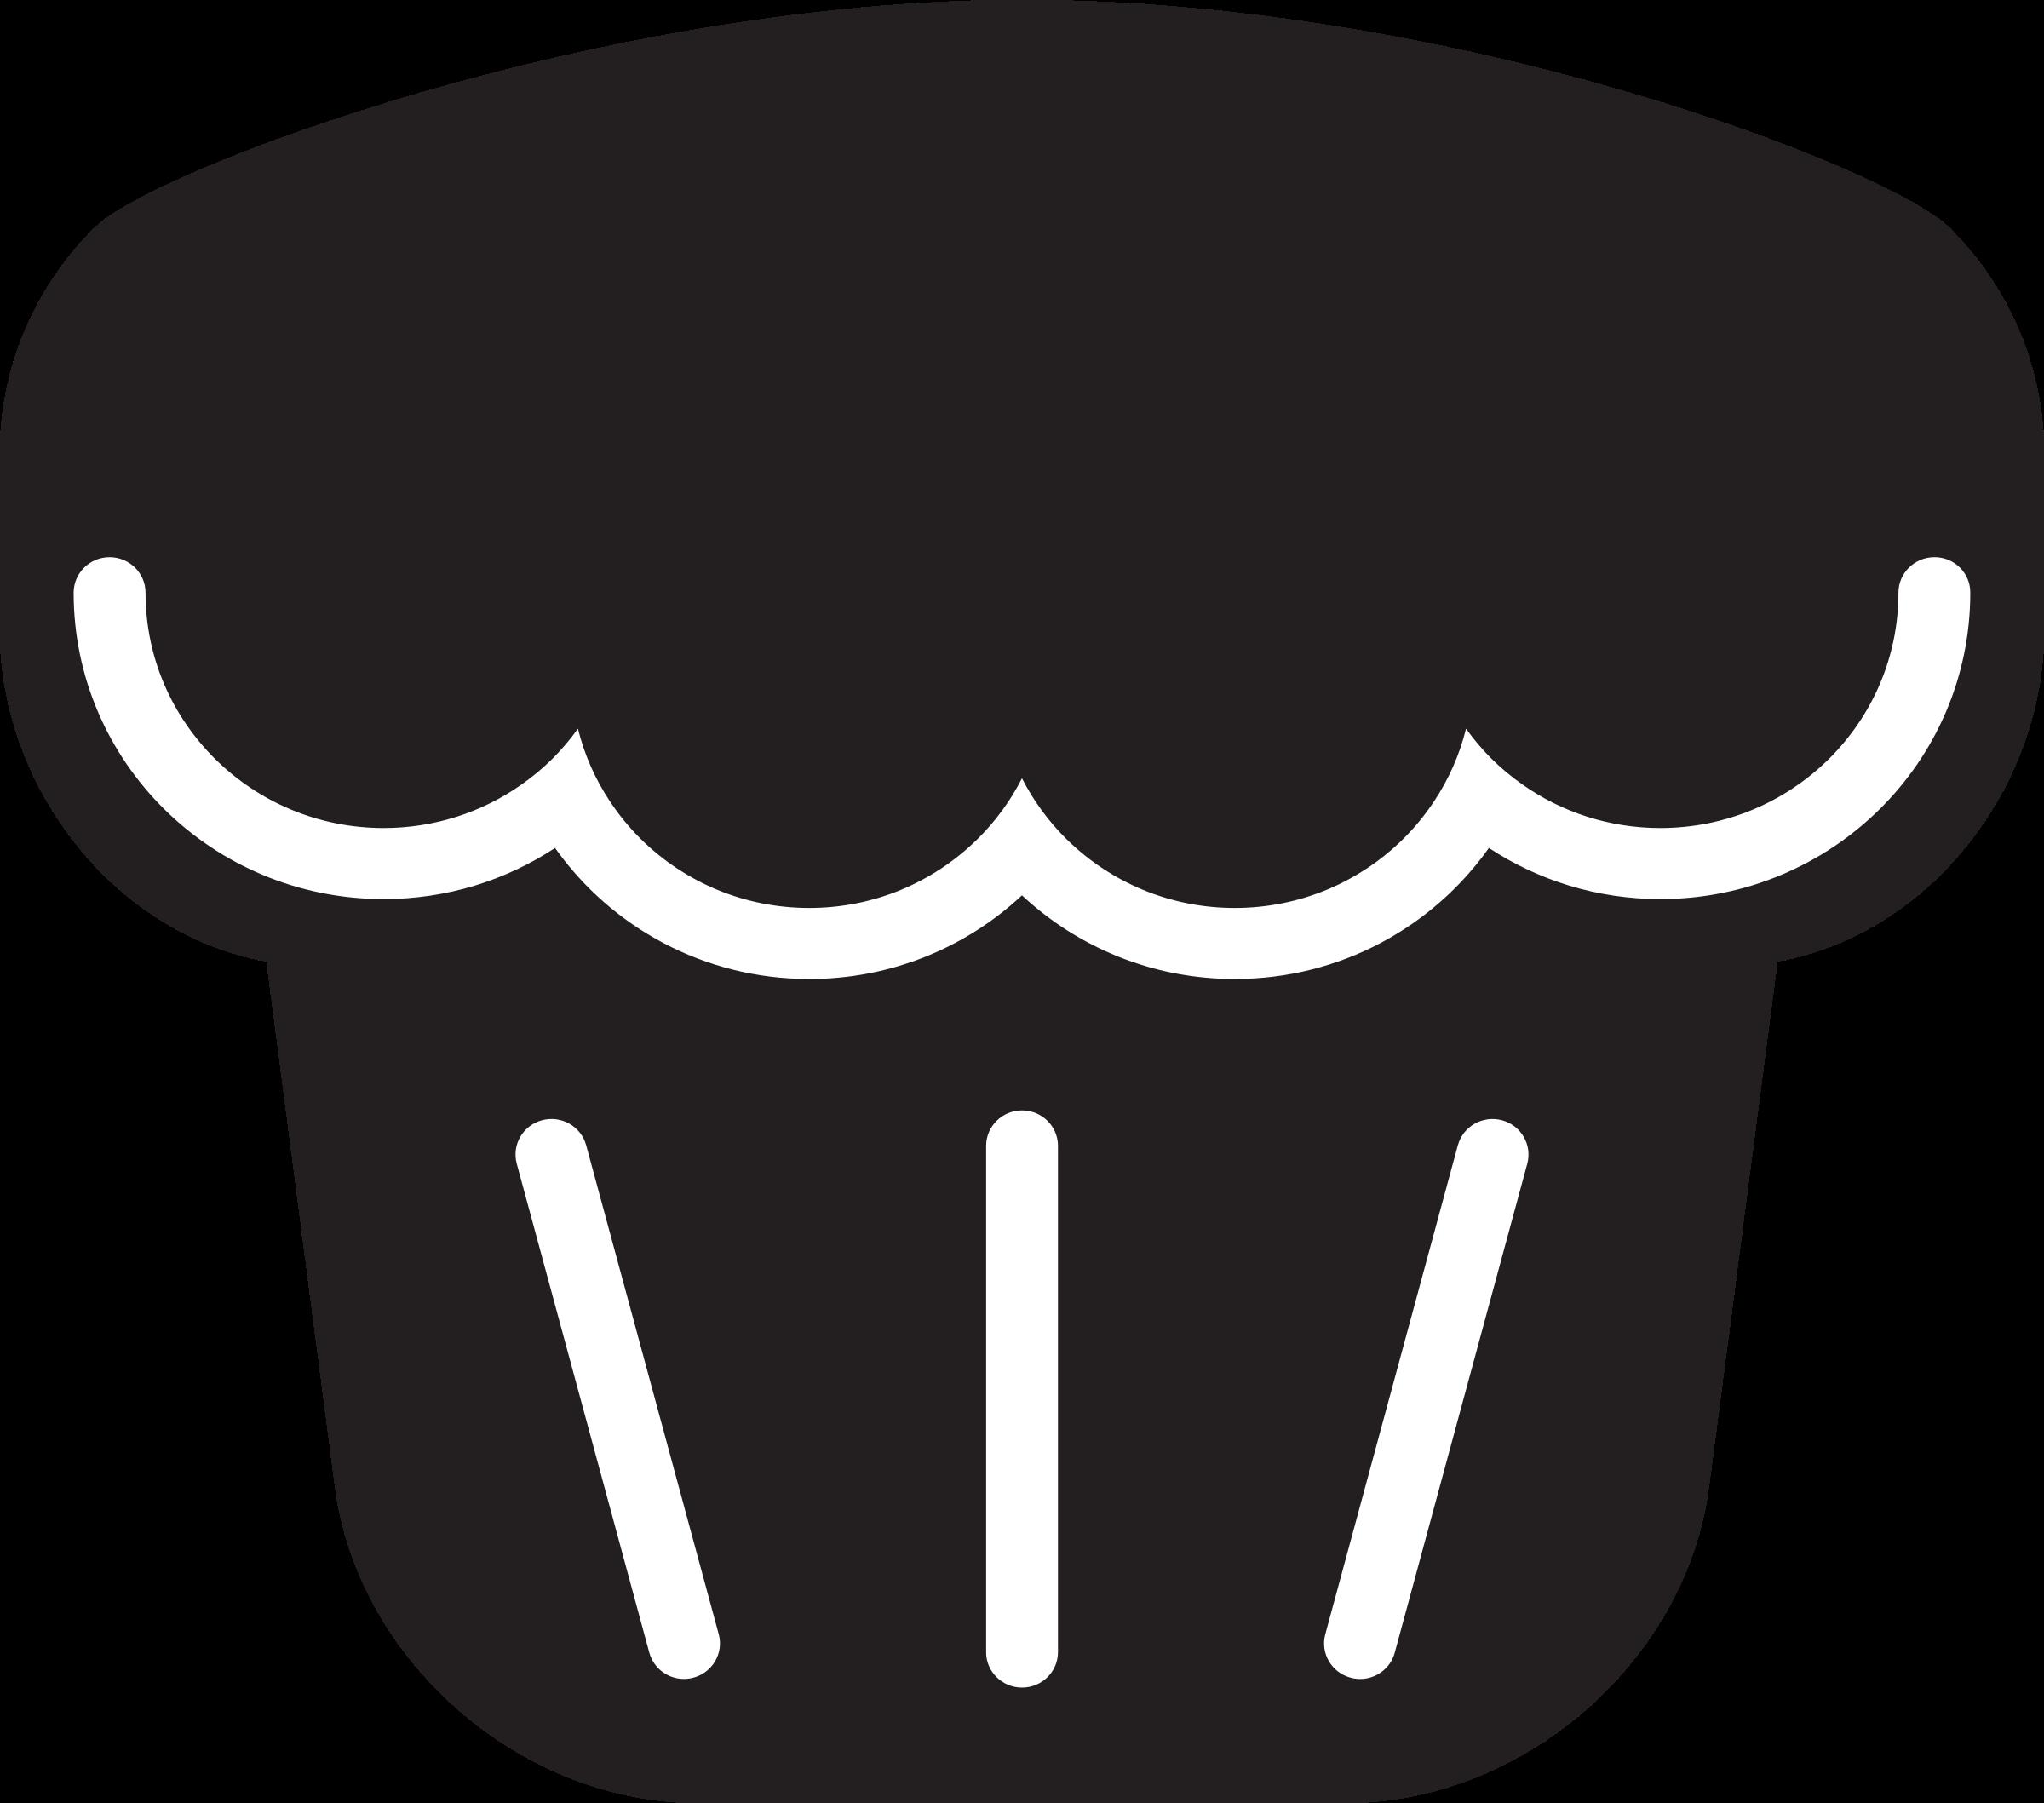 Icon muffin big image. Clipart kitchen illustration